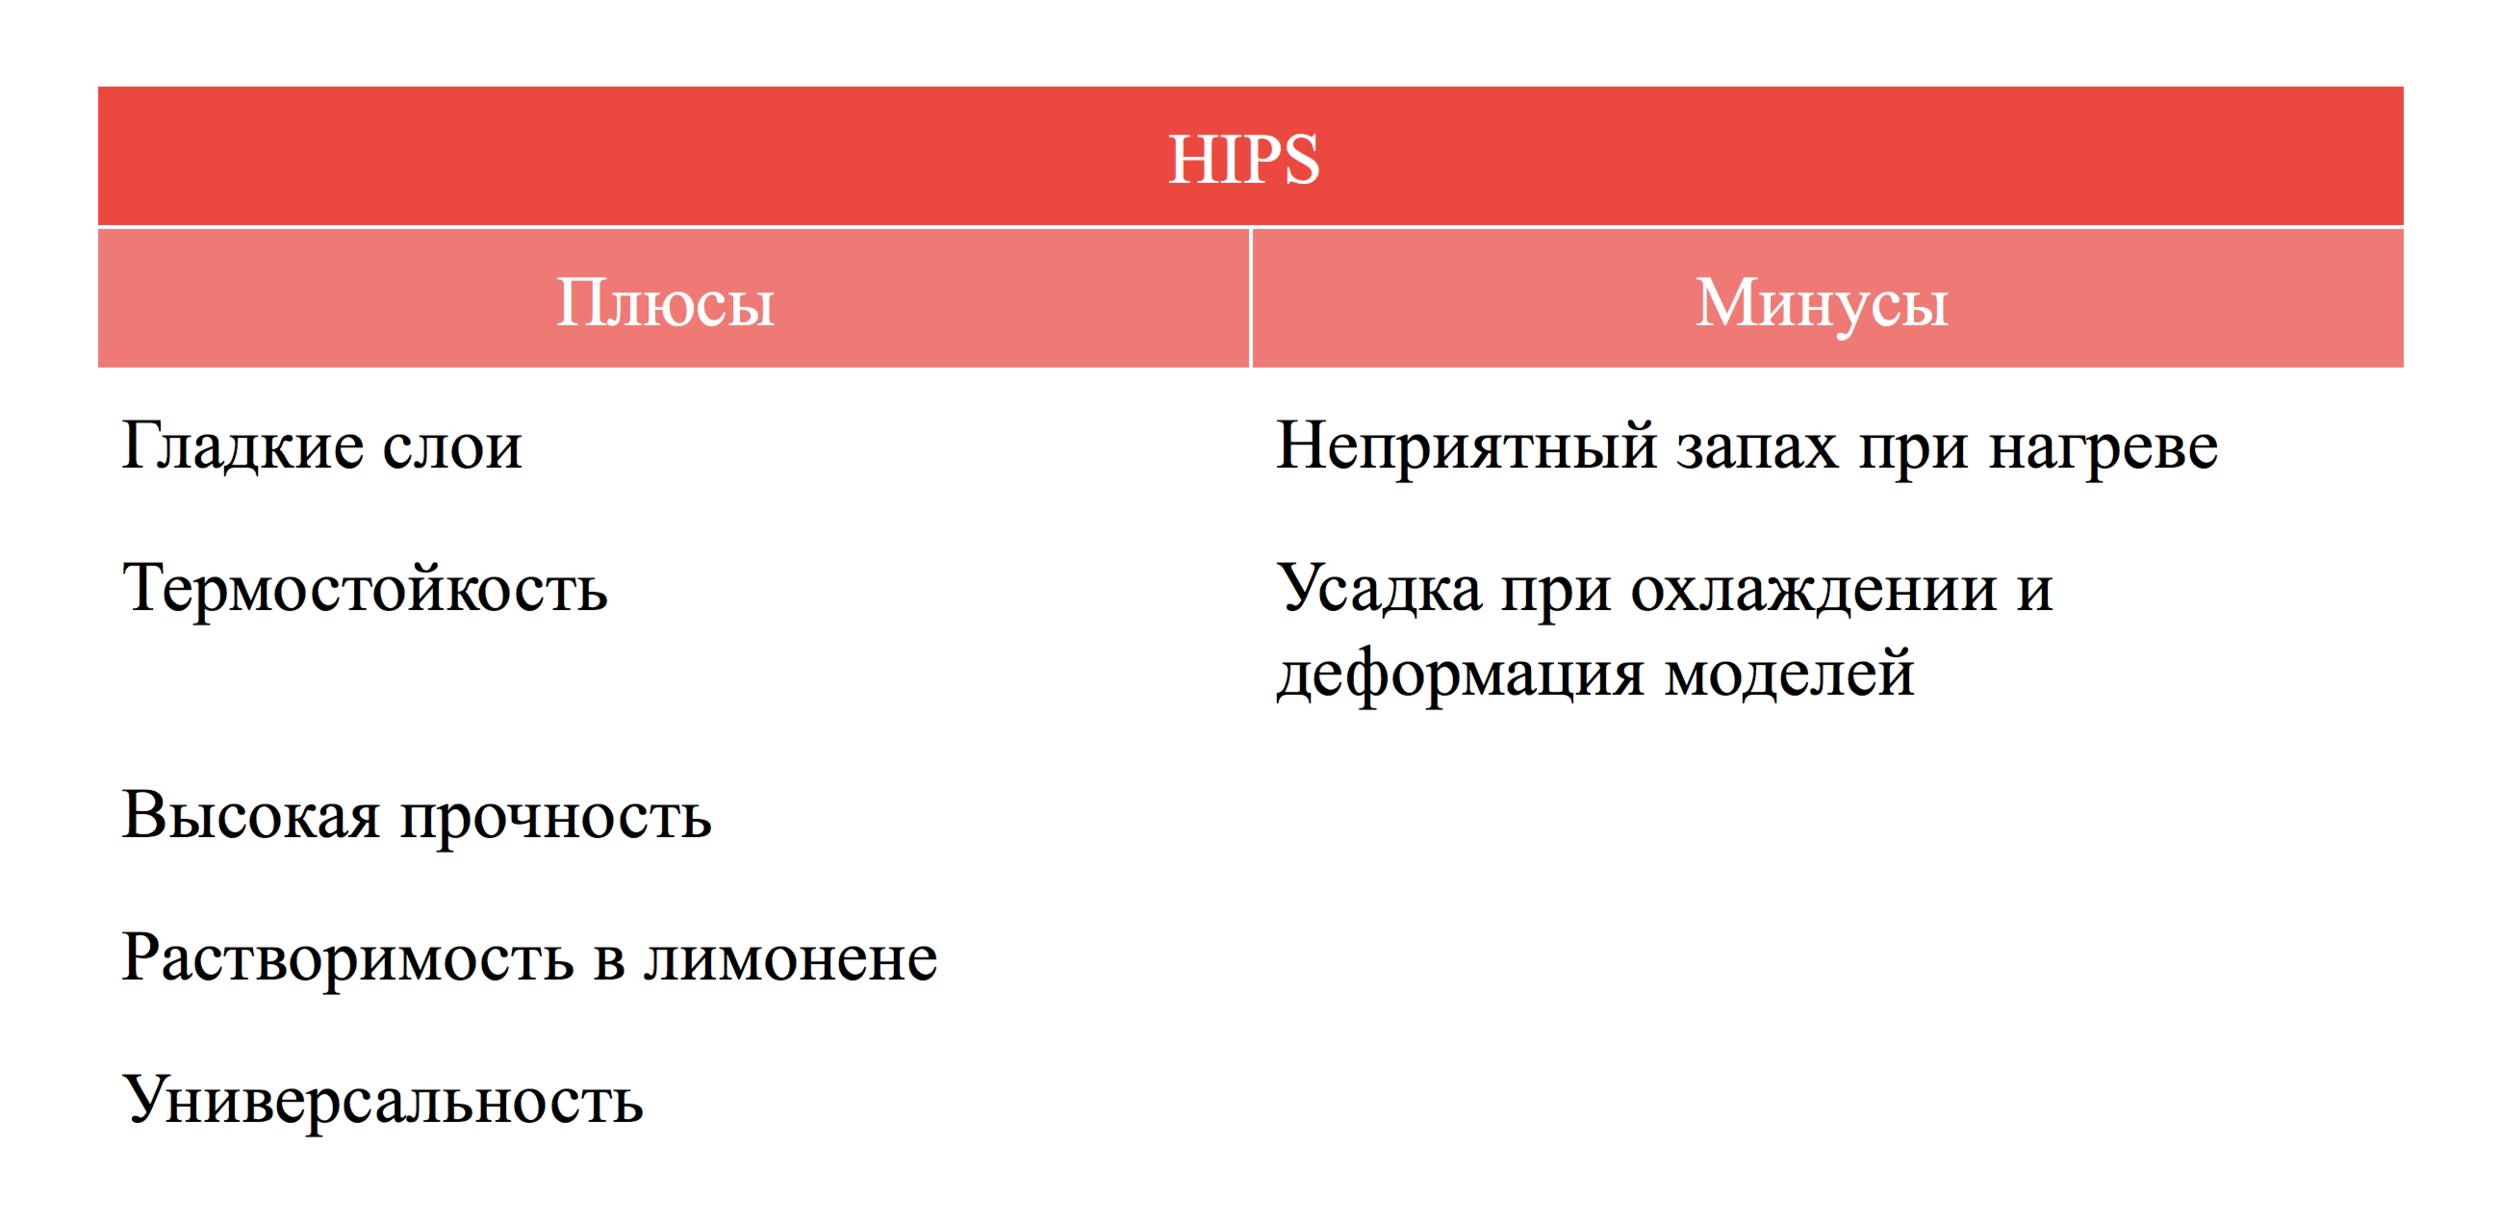 Плюсы и минусы HIPS пластика qbed.space.png